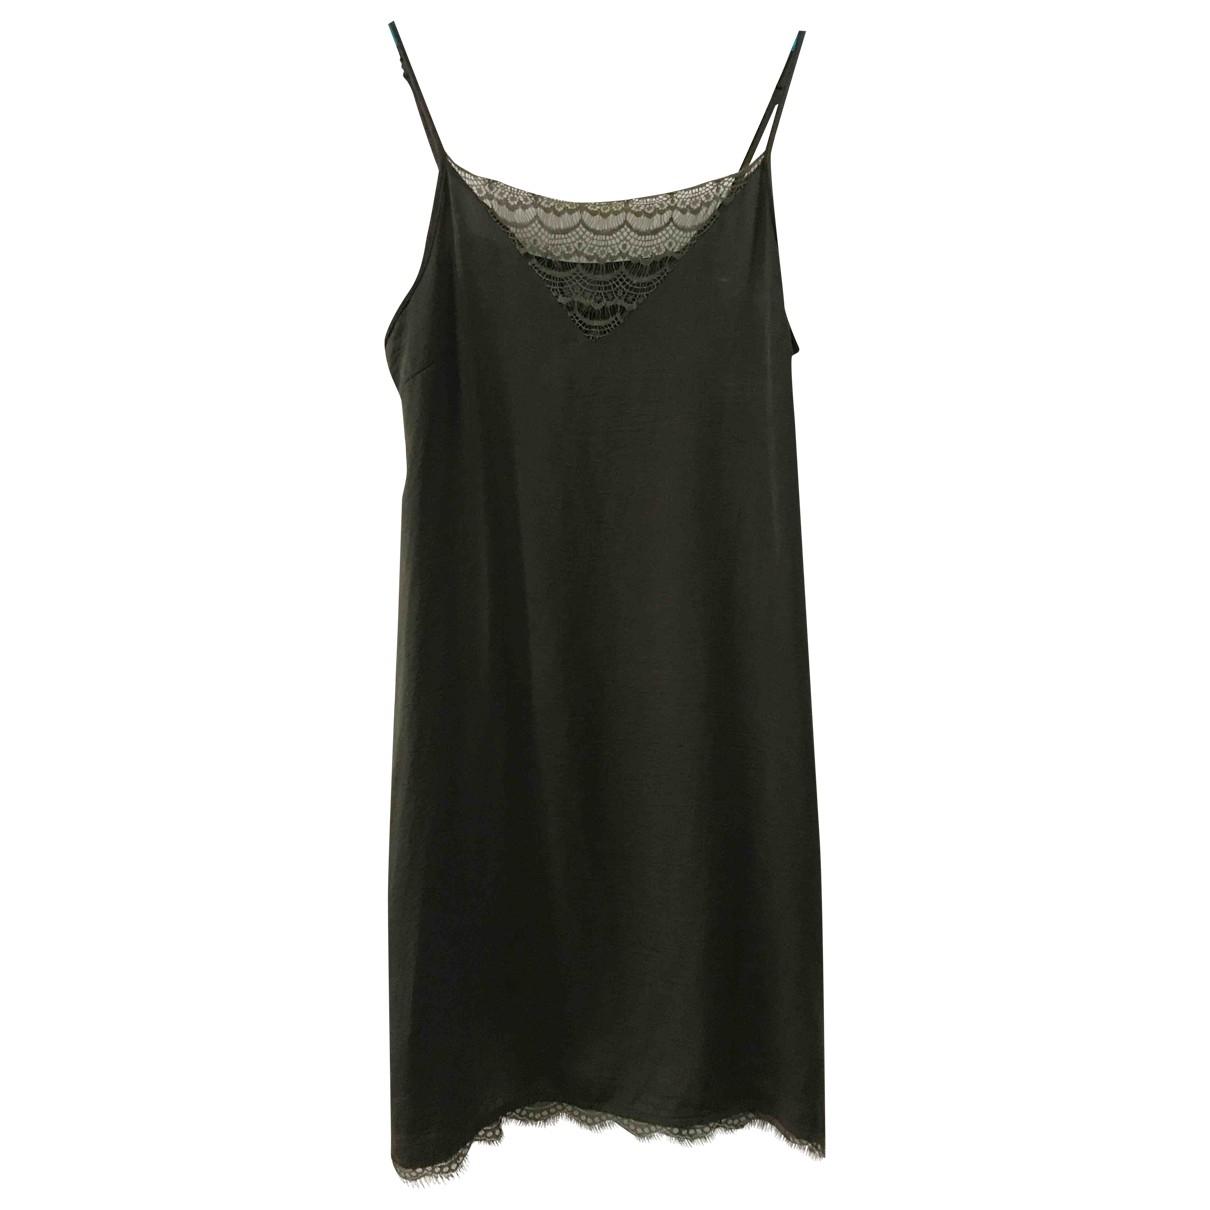 Ichi \N Kleid in  Khaki Polyester